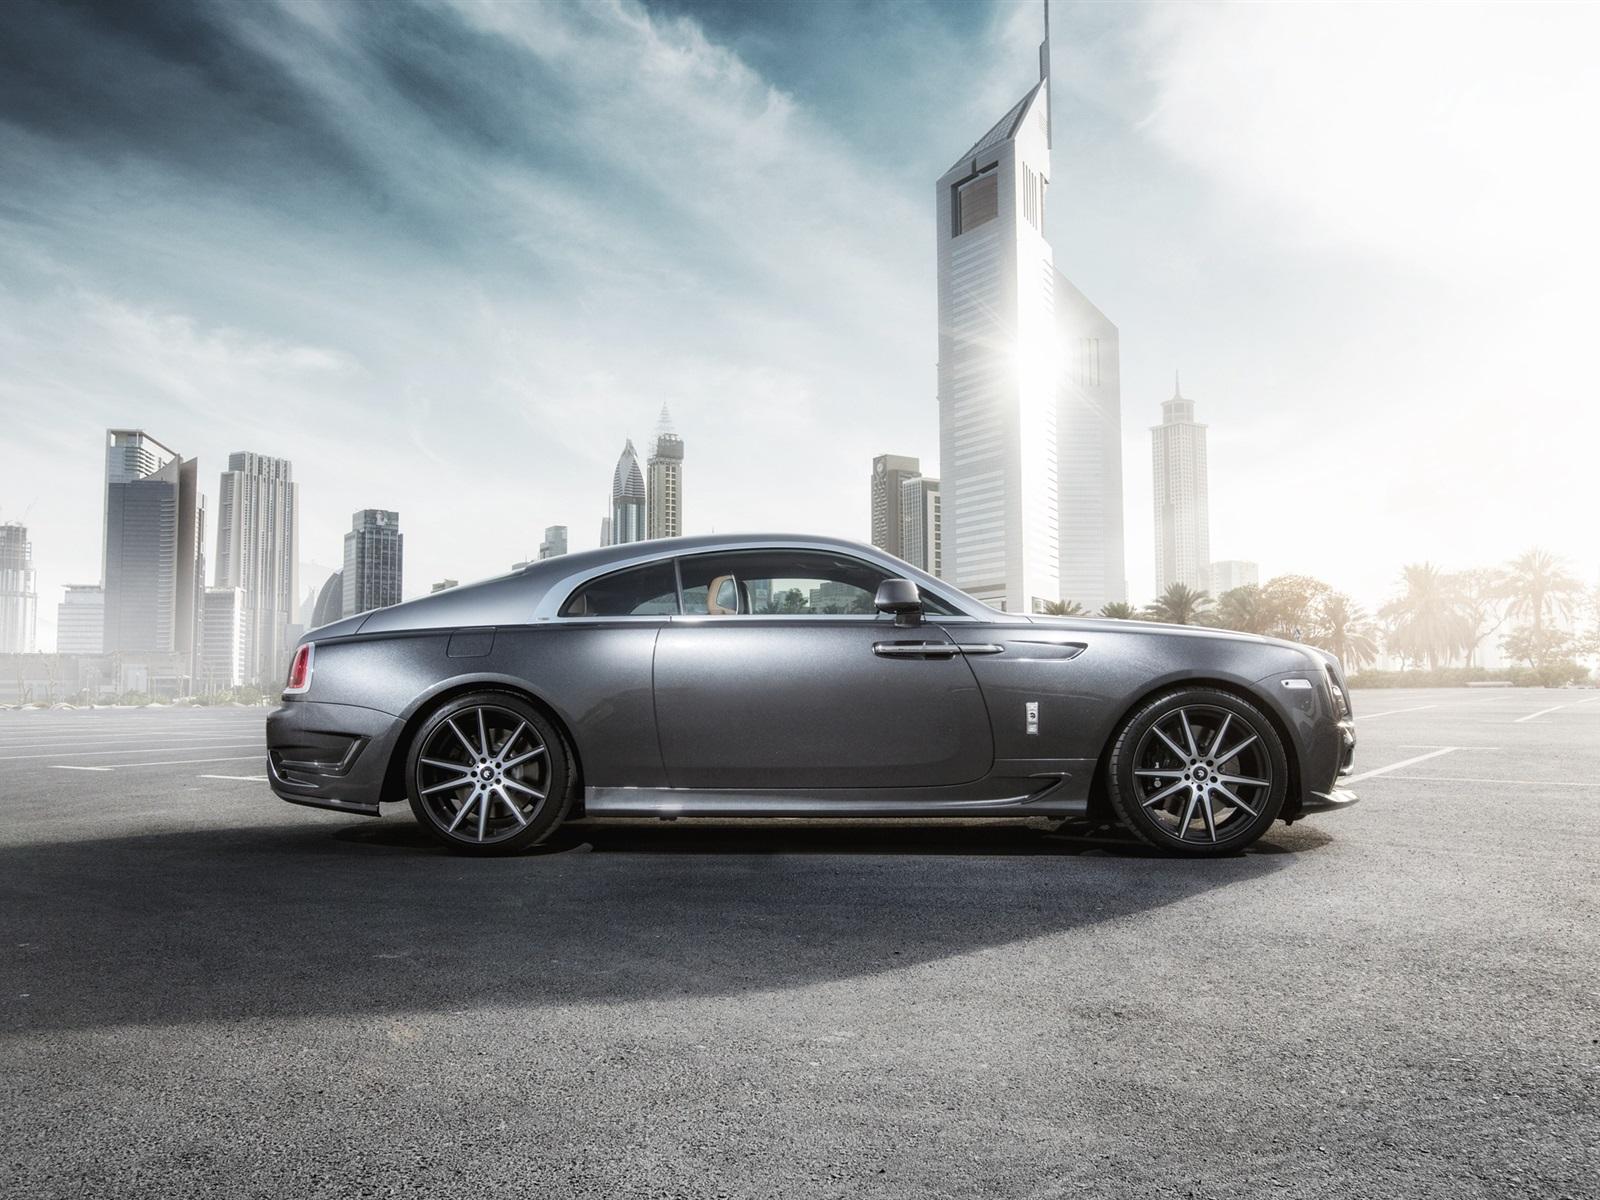 16 Luxury Pubg Wallpaper Iphone 6: 壁紙 市内のロールス・ロイス・レイスの高級車 2560x1600 HD 無料